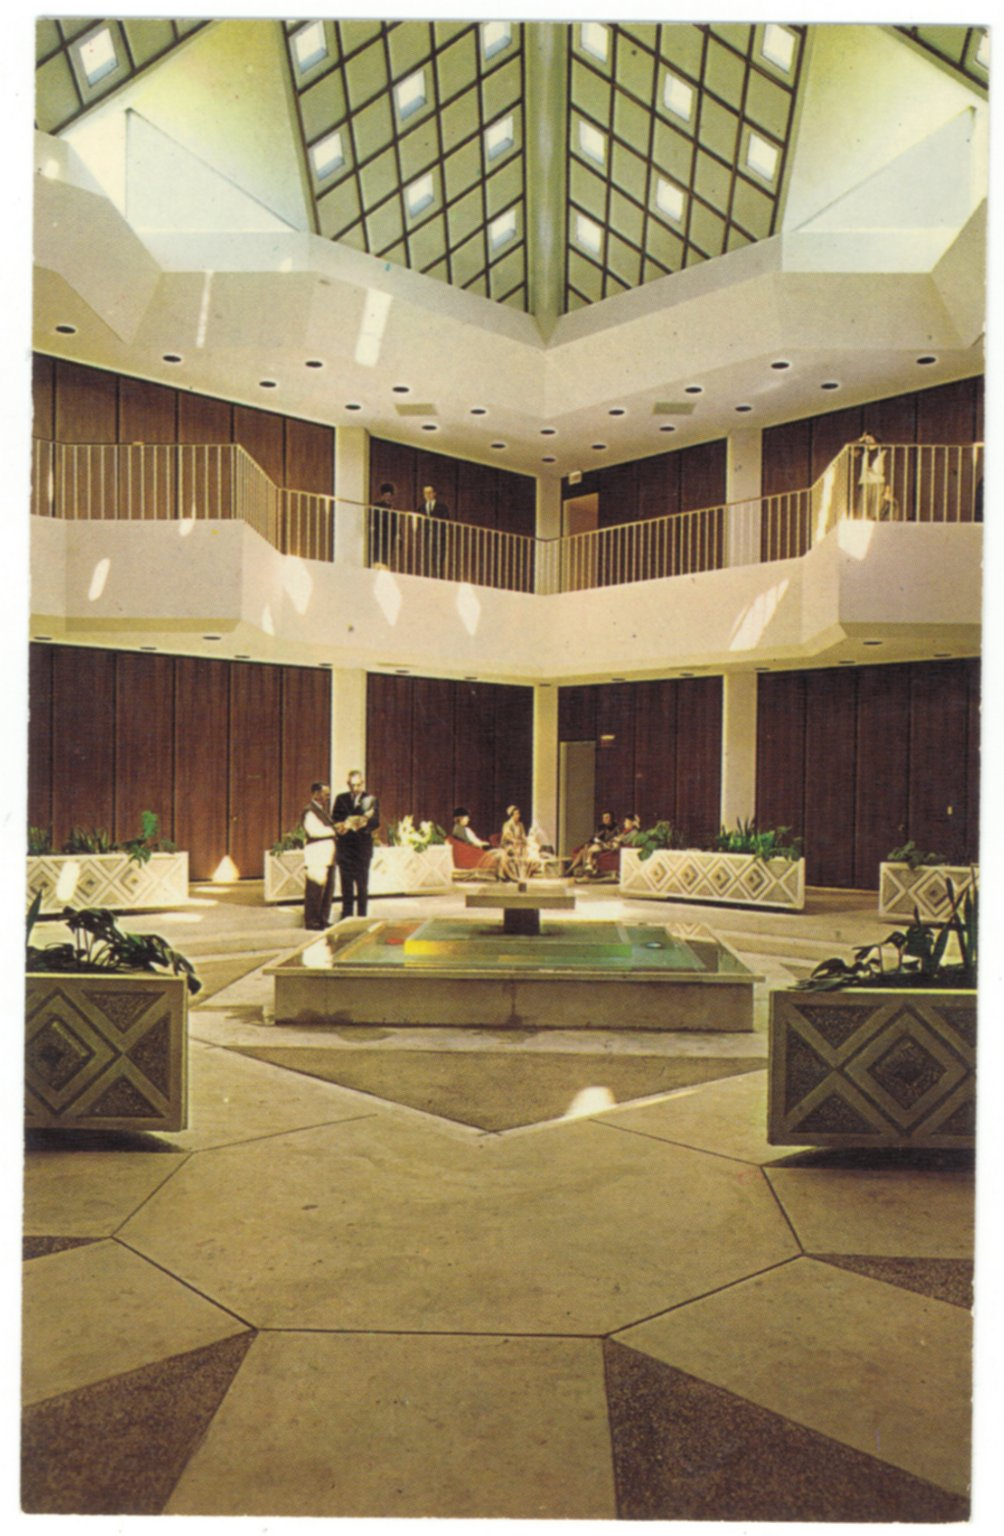 Paducah's New City Hall